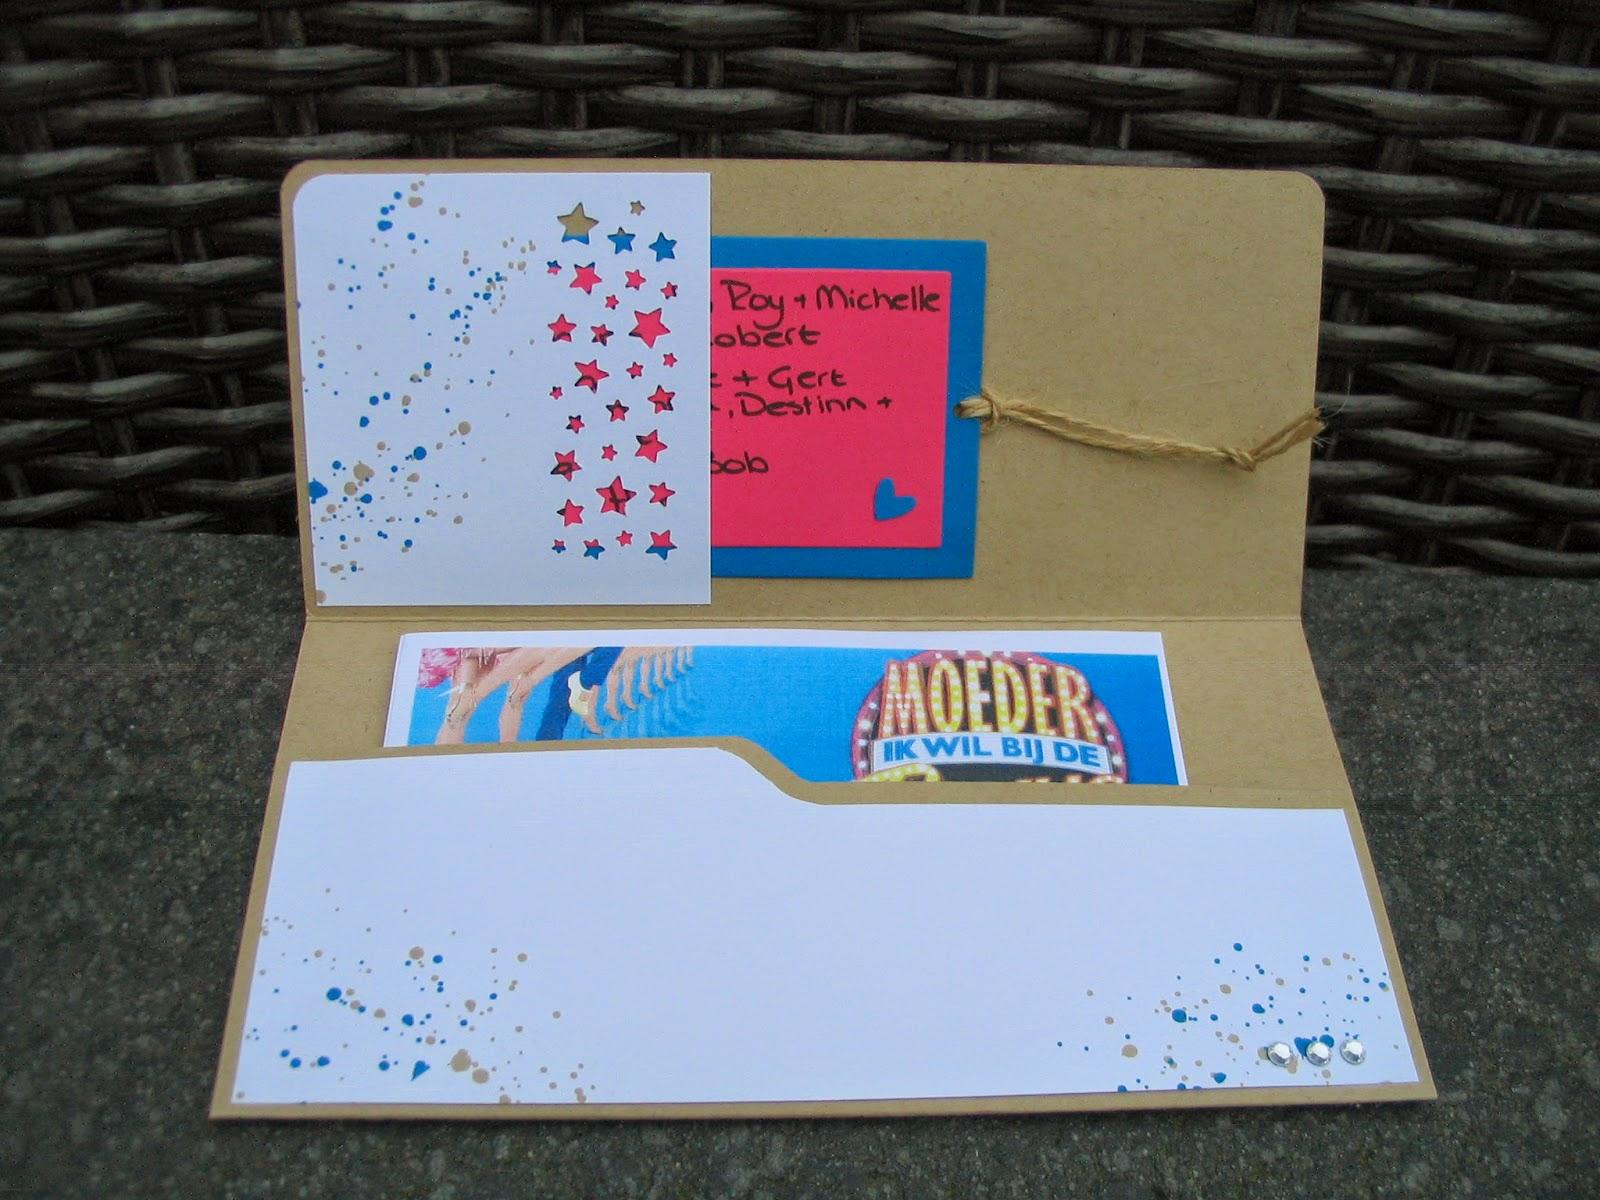 Mariannes Scrapcards Kado Envelop Voor Het 55 Jarig